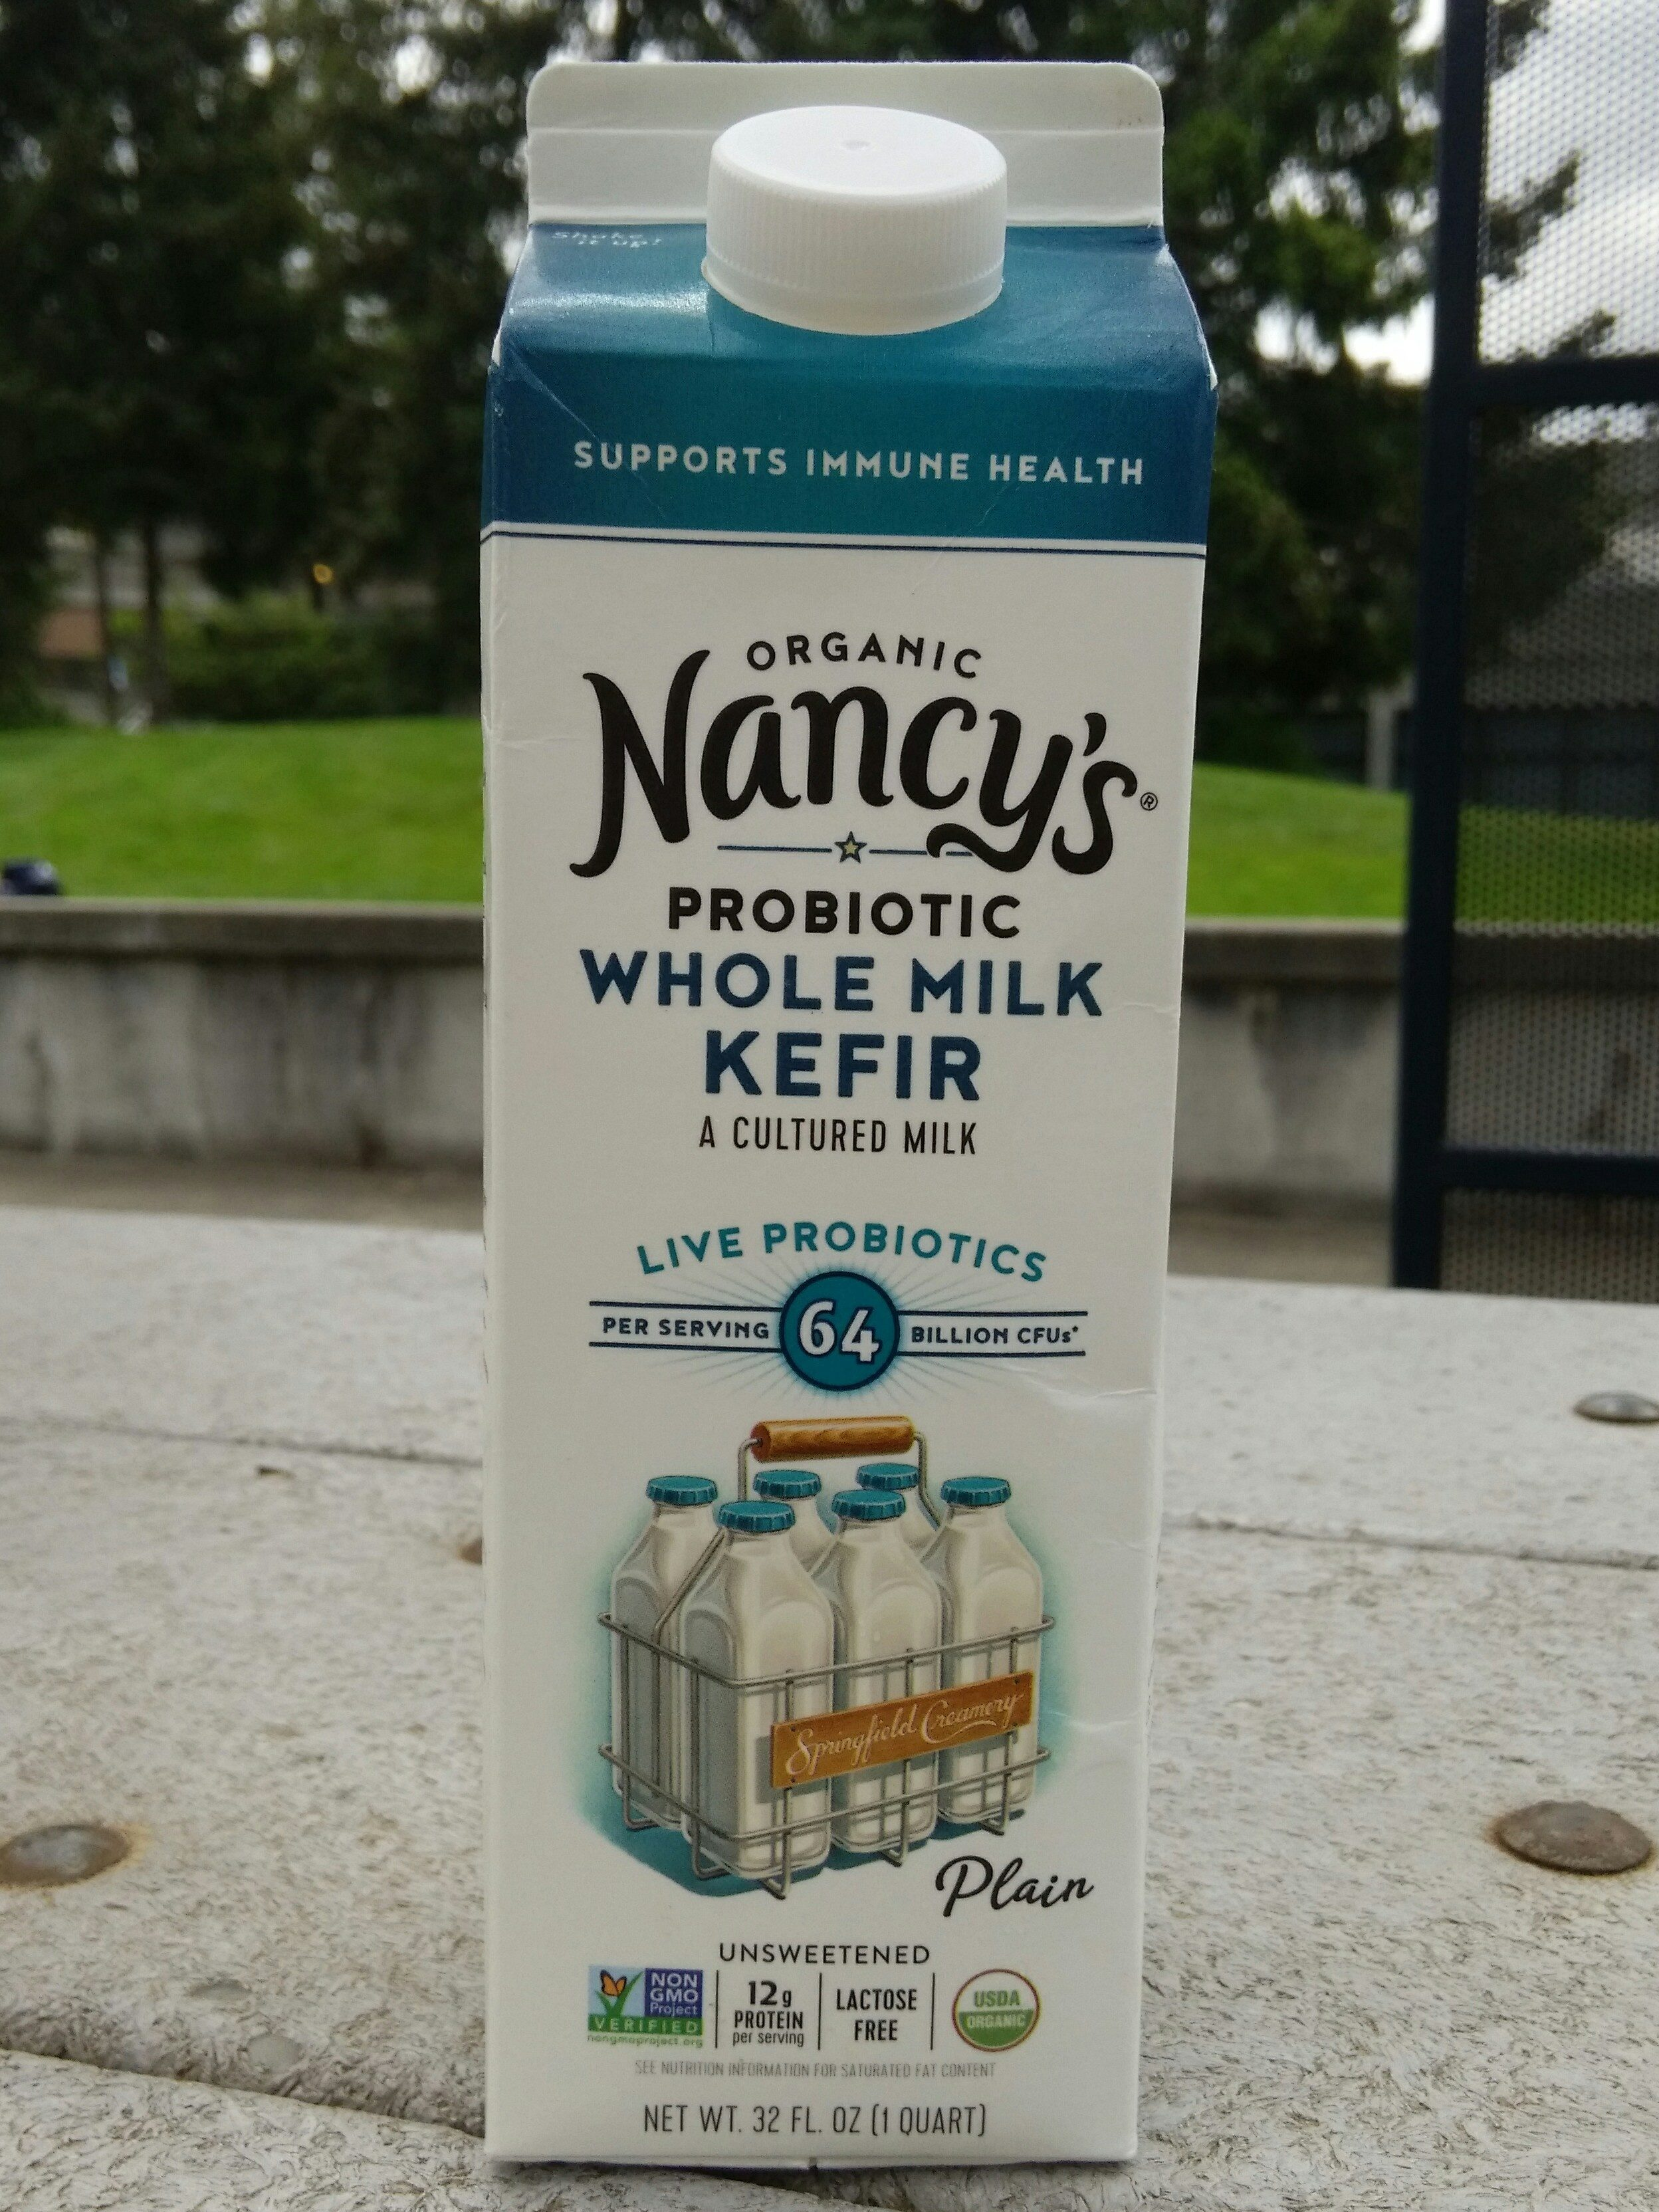 Whole Milk Kefir (Organic) - Product